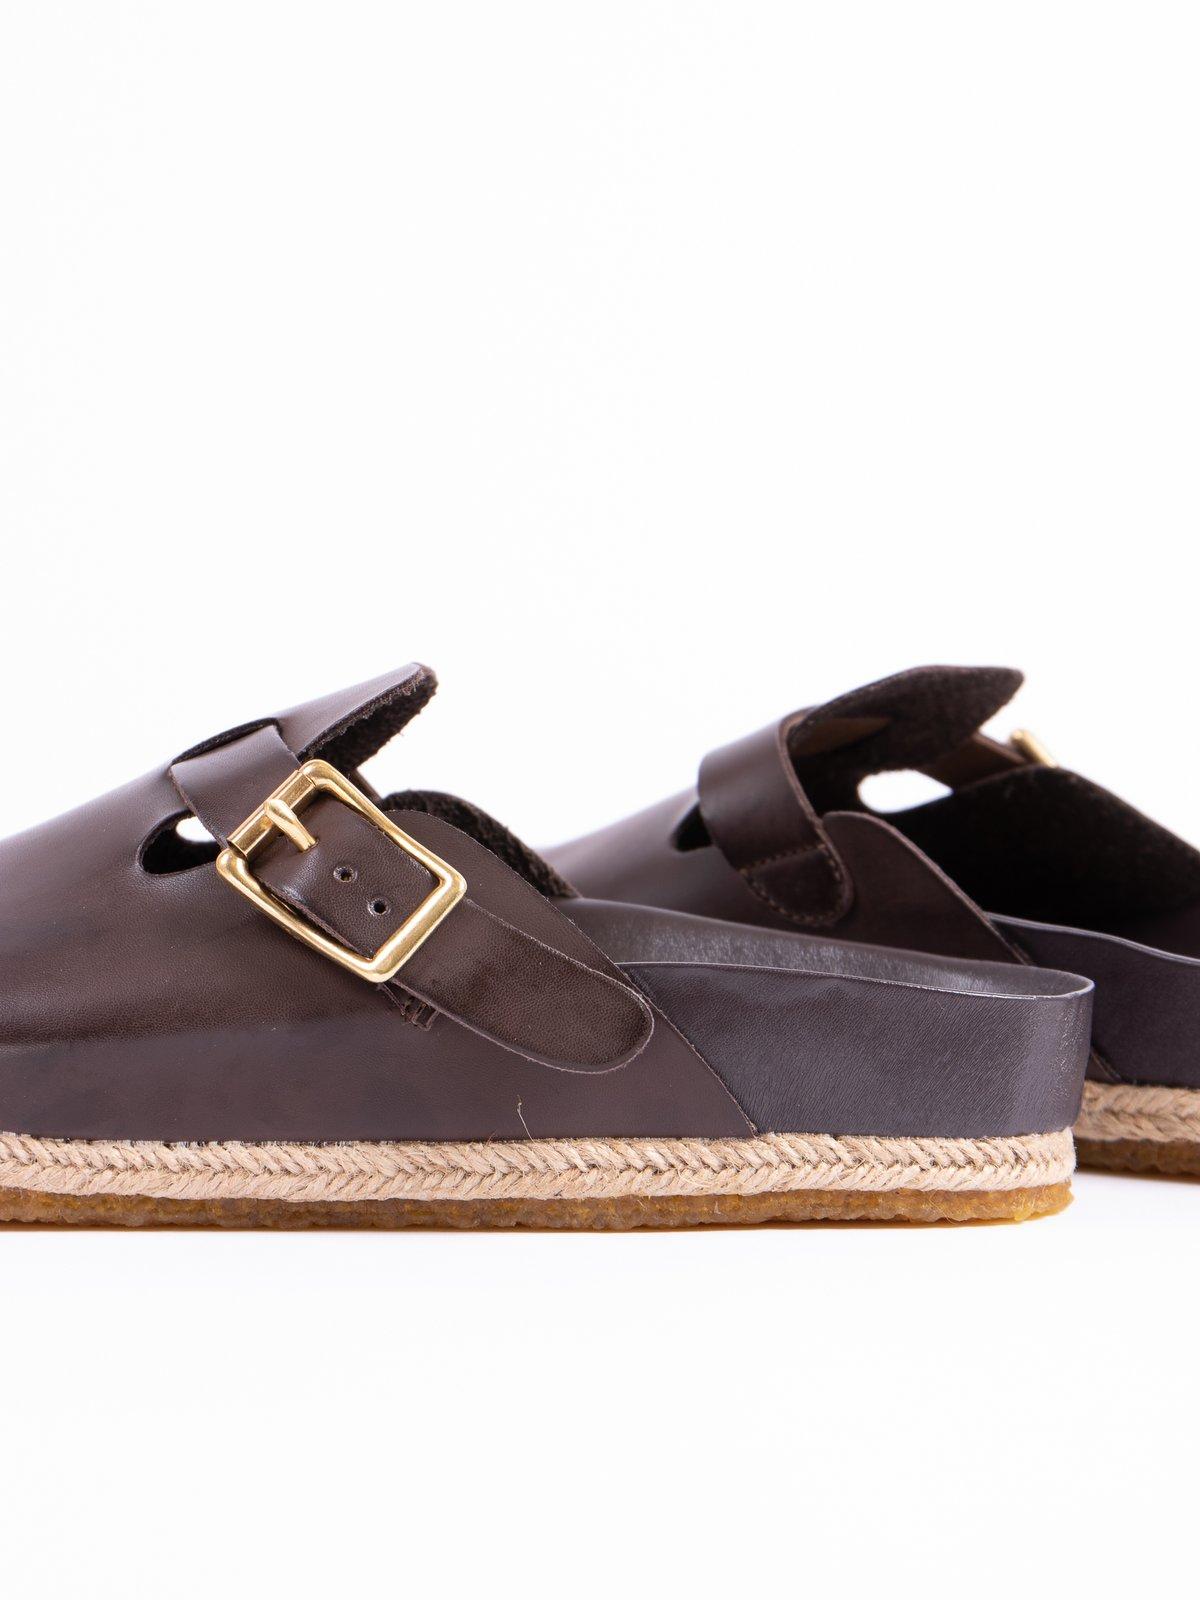 Brown Bostonian Sandal - Image 4